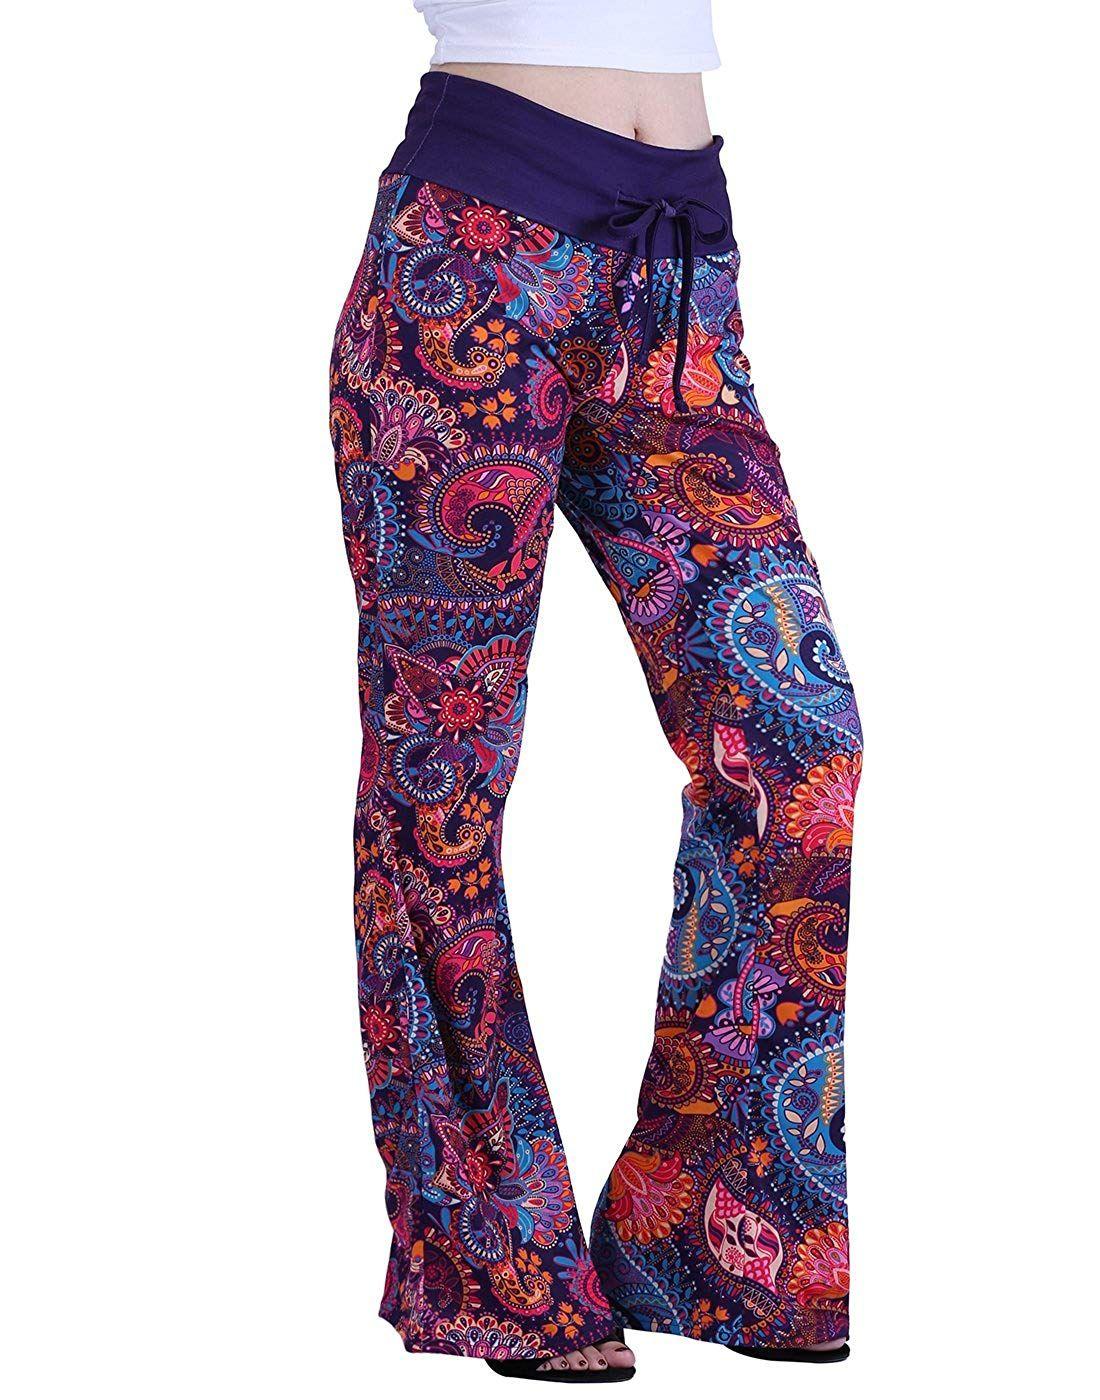 80a7bd7371 Women s Sleep   Loungewear - HDE Womens Cotton Pajama Pants Wide Leg  Sleepwear Casual Loose Lounge